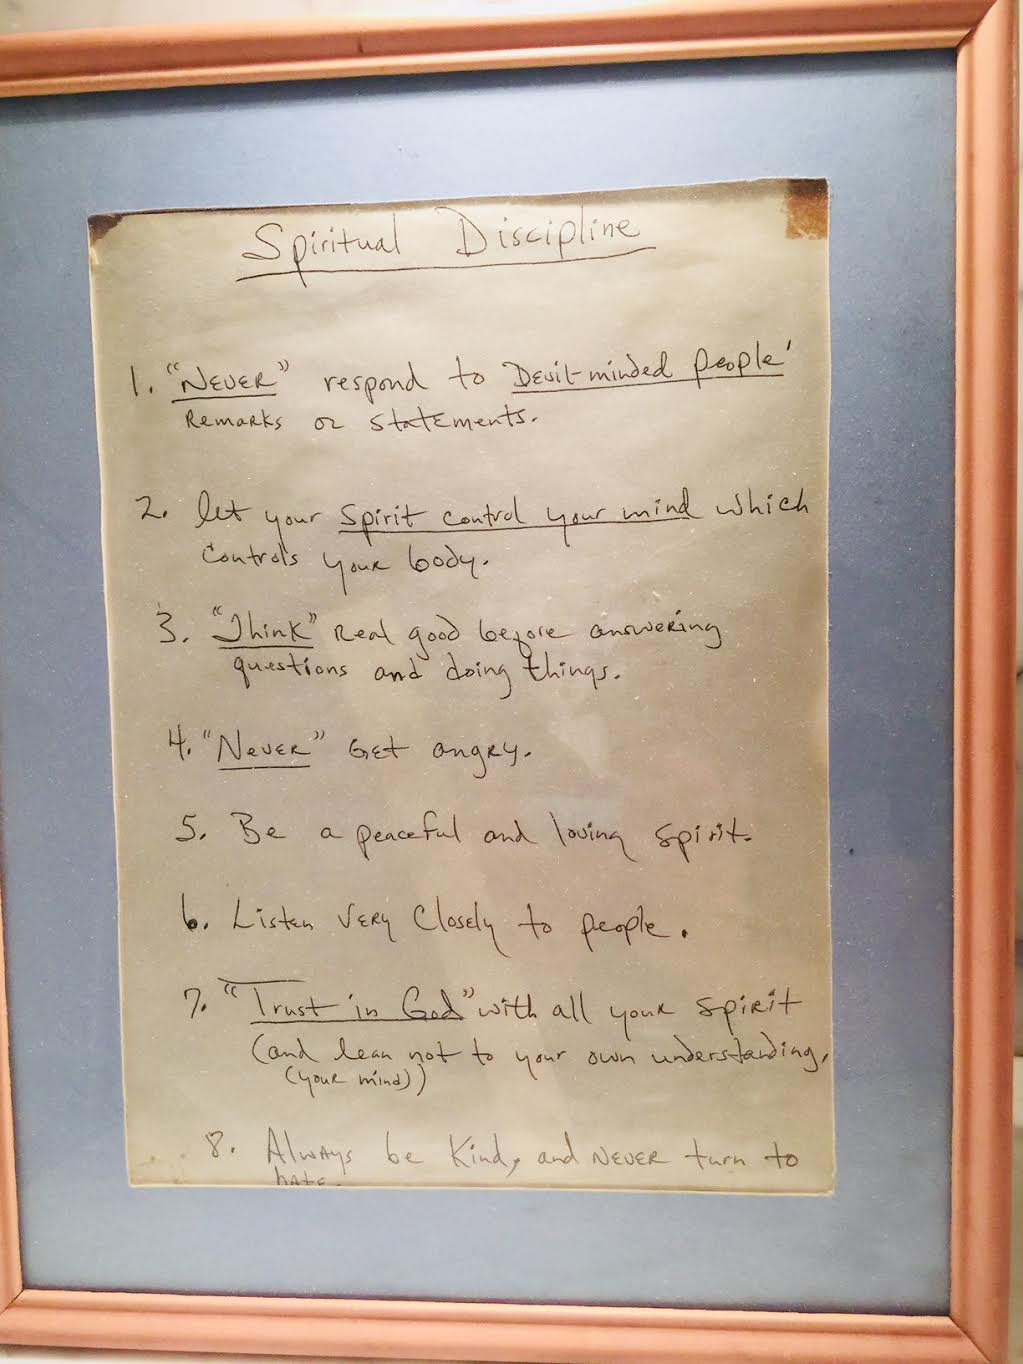 aretha Franklin spiritual discipline